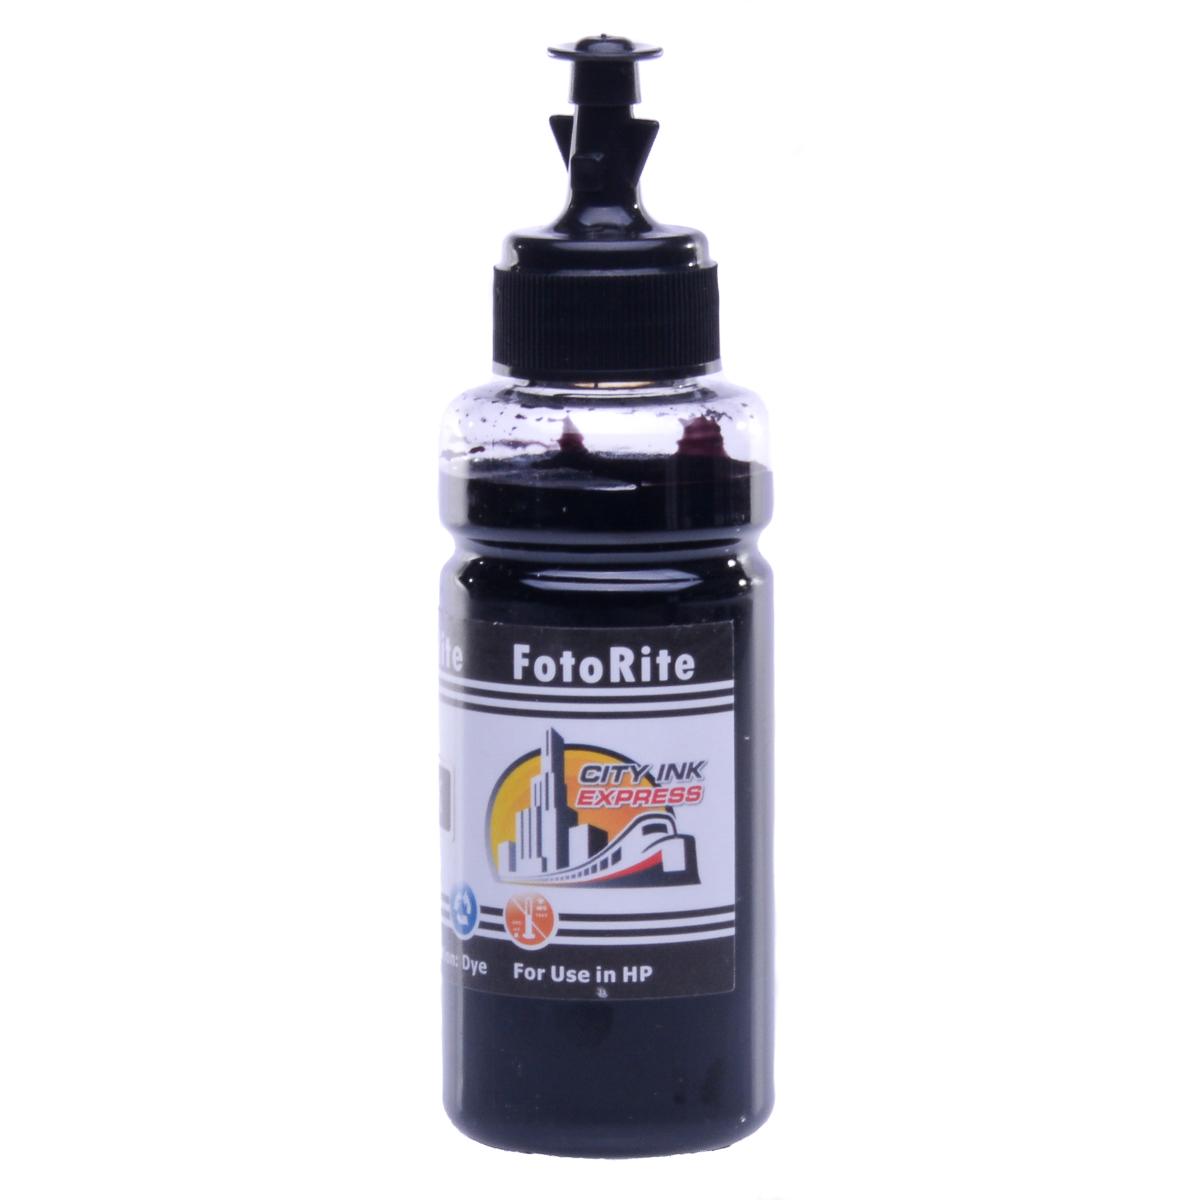 Cheap Black dye ink replaces HP Officejet 6515 - HP 364